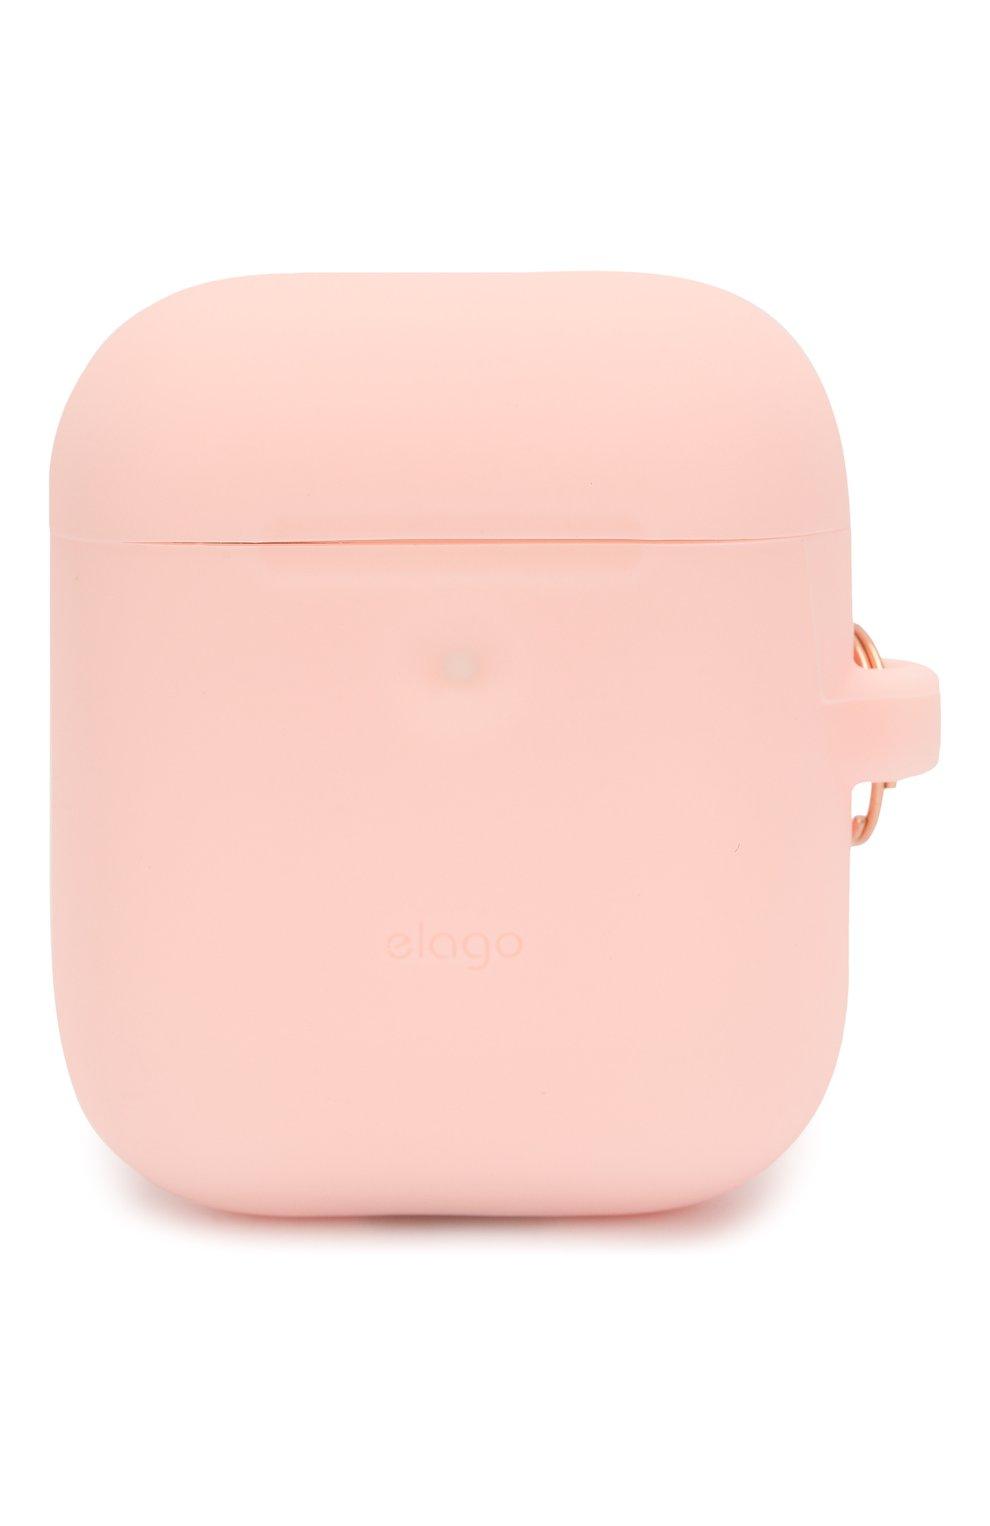 Чехол для airpods wireless ELAGO розового цвета, арт. EAP2SC-HANG-PK | Фото 1 (Статус проверки: Проверена категория)